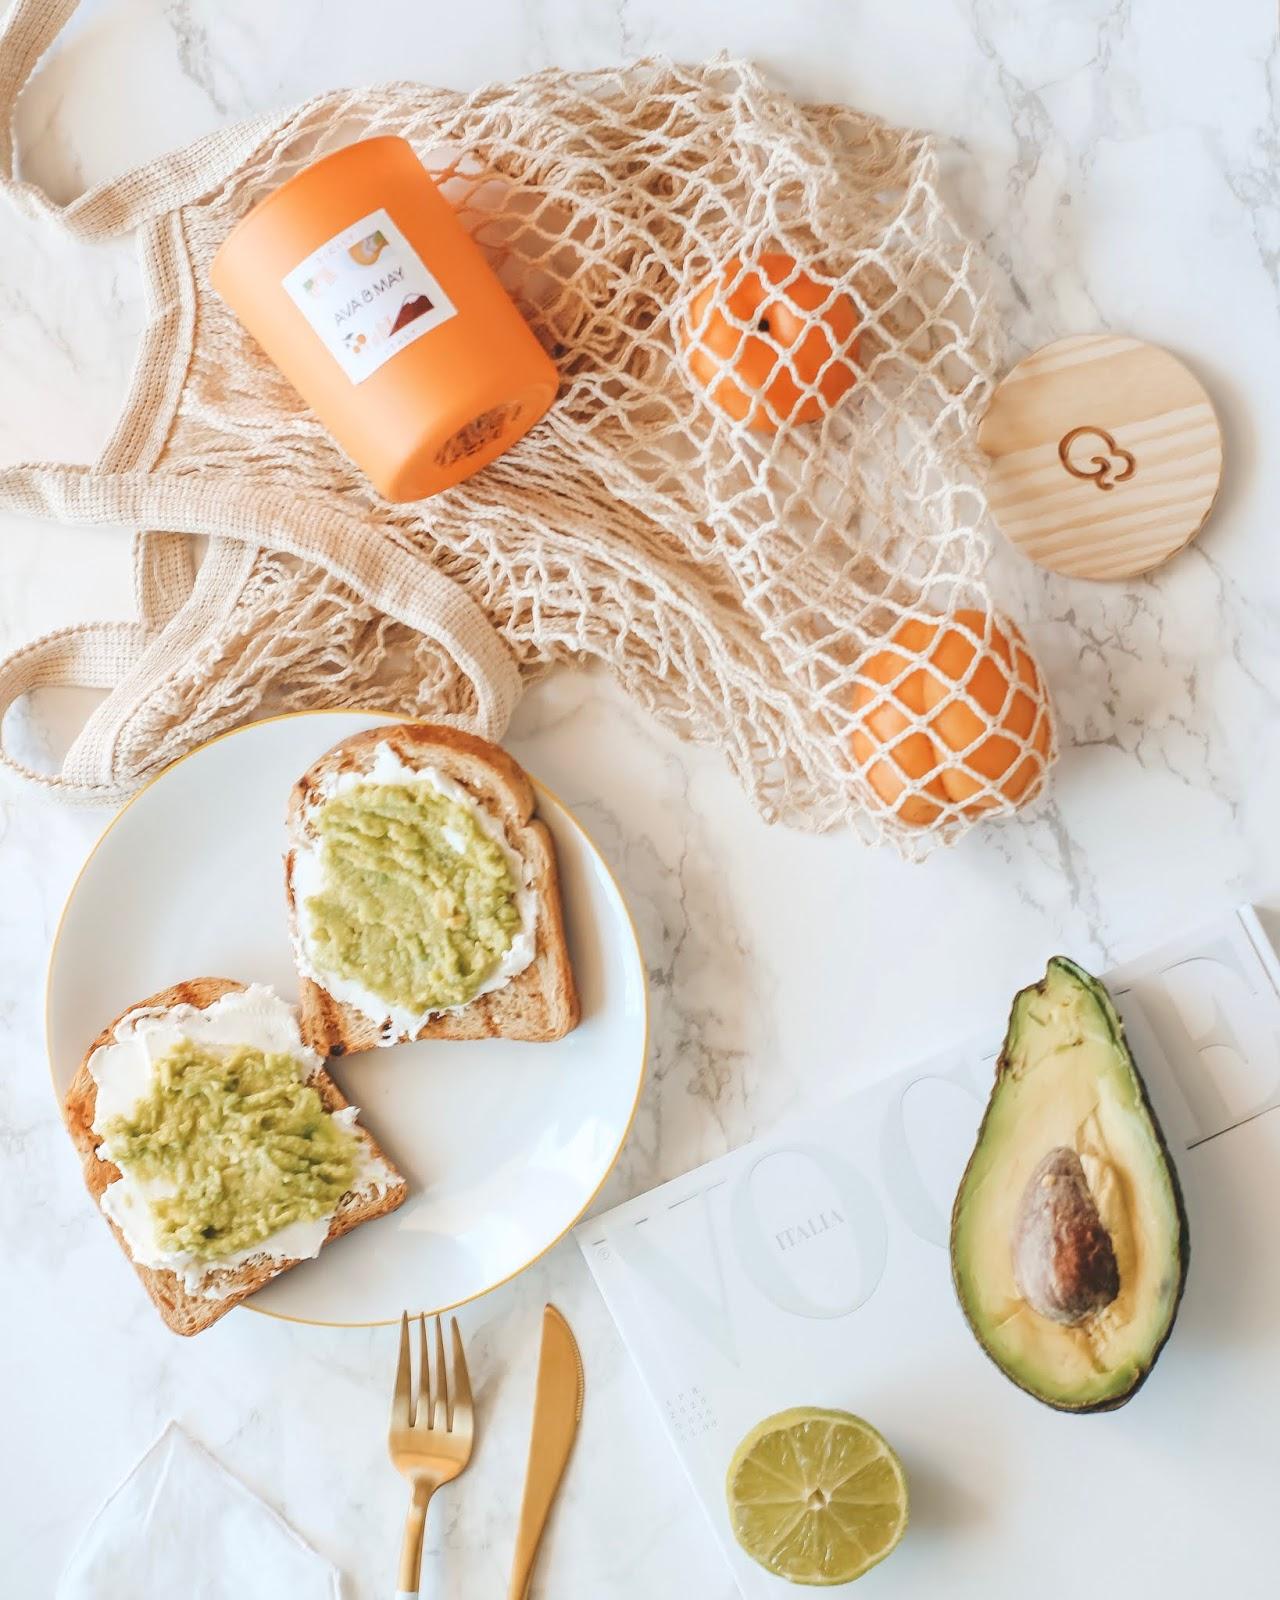 Avocado toast flatlay brunch